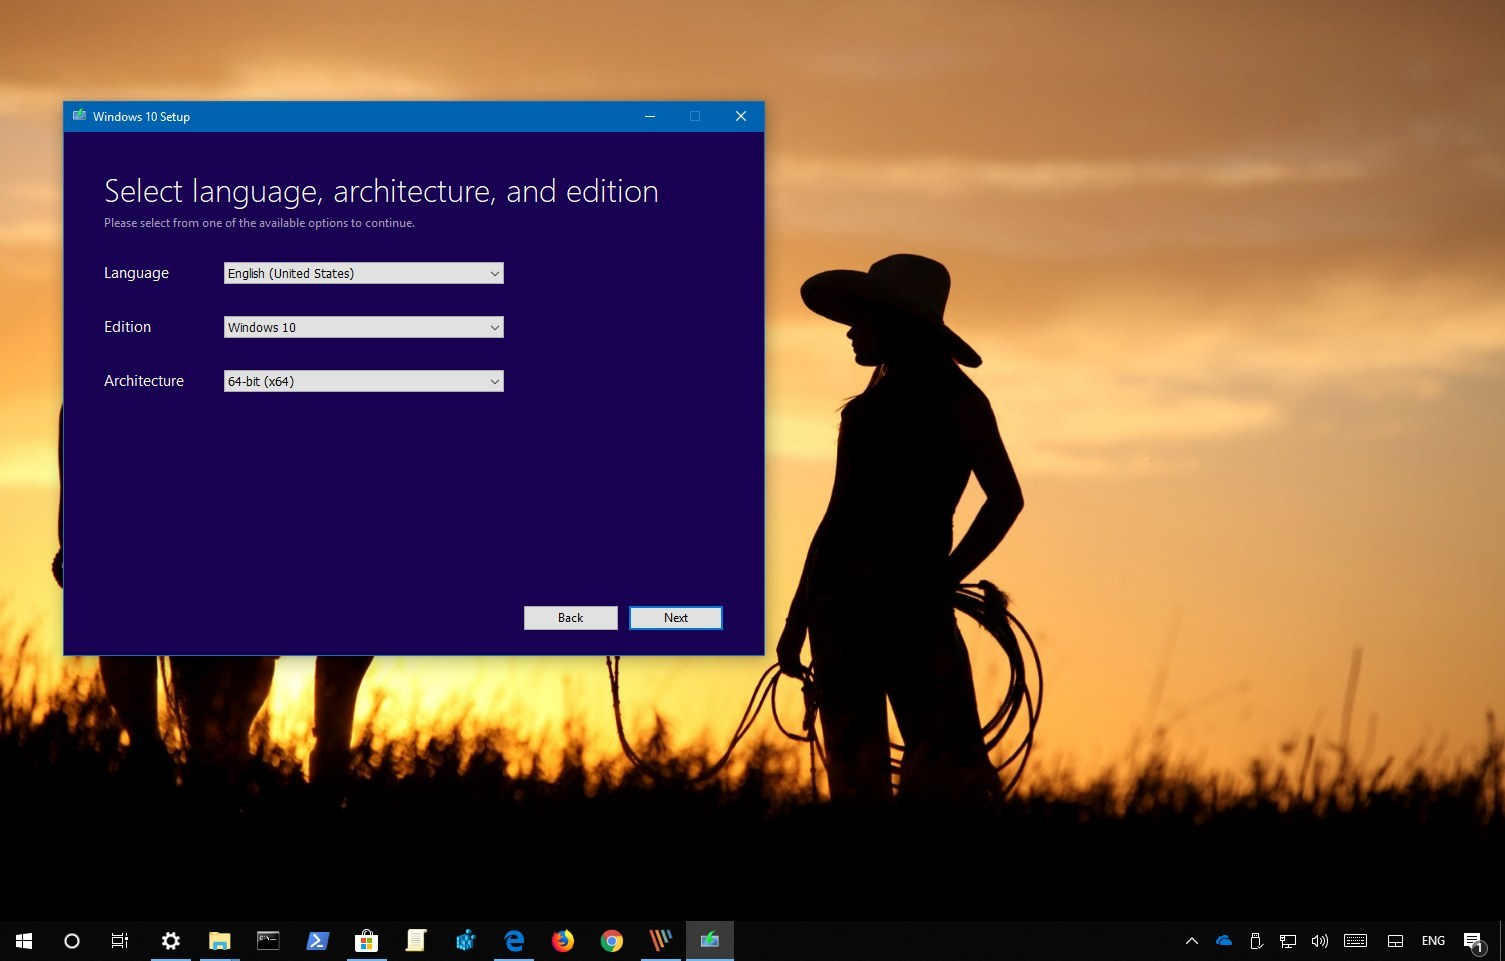 Rose Glen North Dakota ⁓ Try These Windows 10 Media Creation Tool